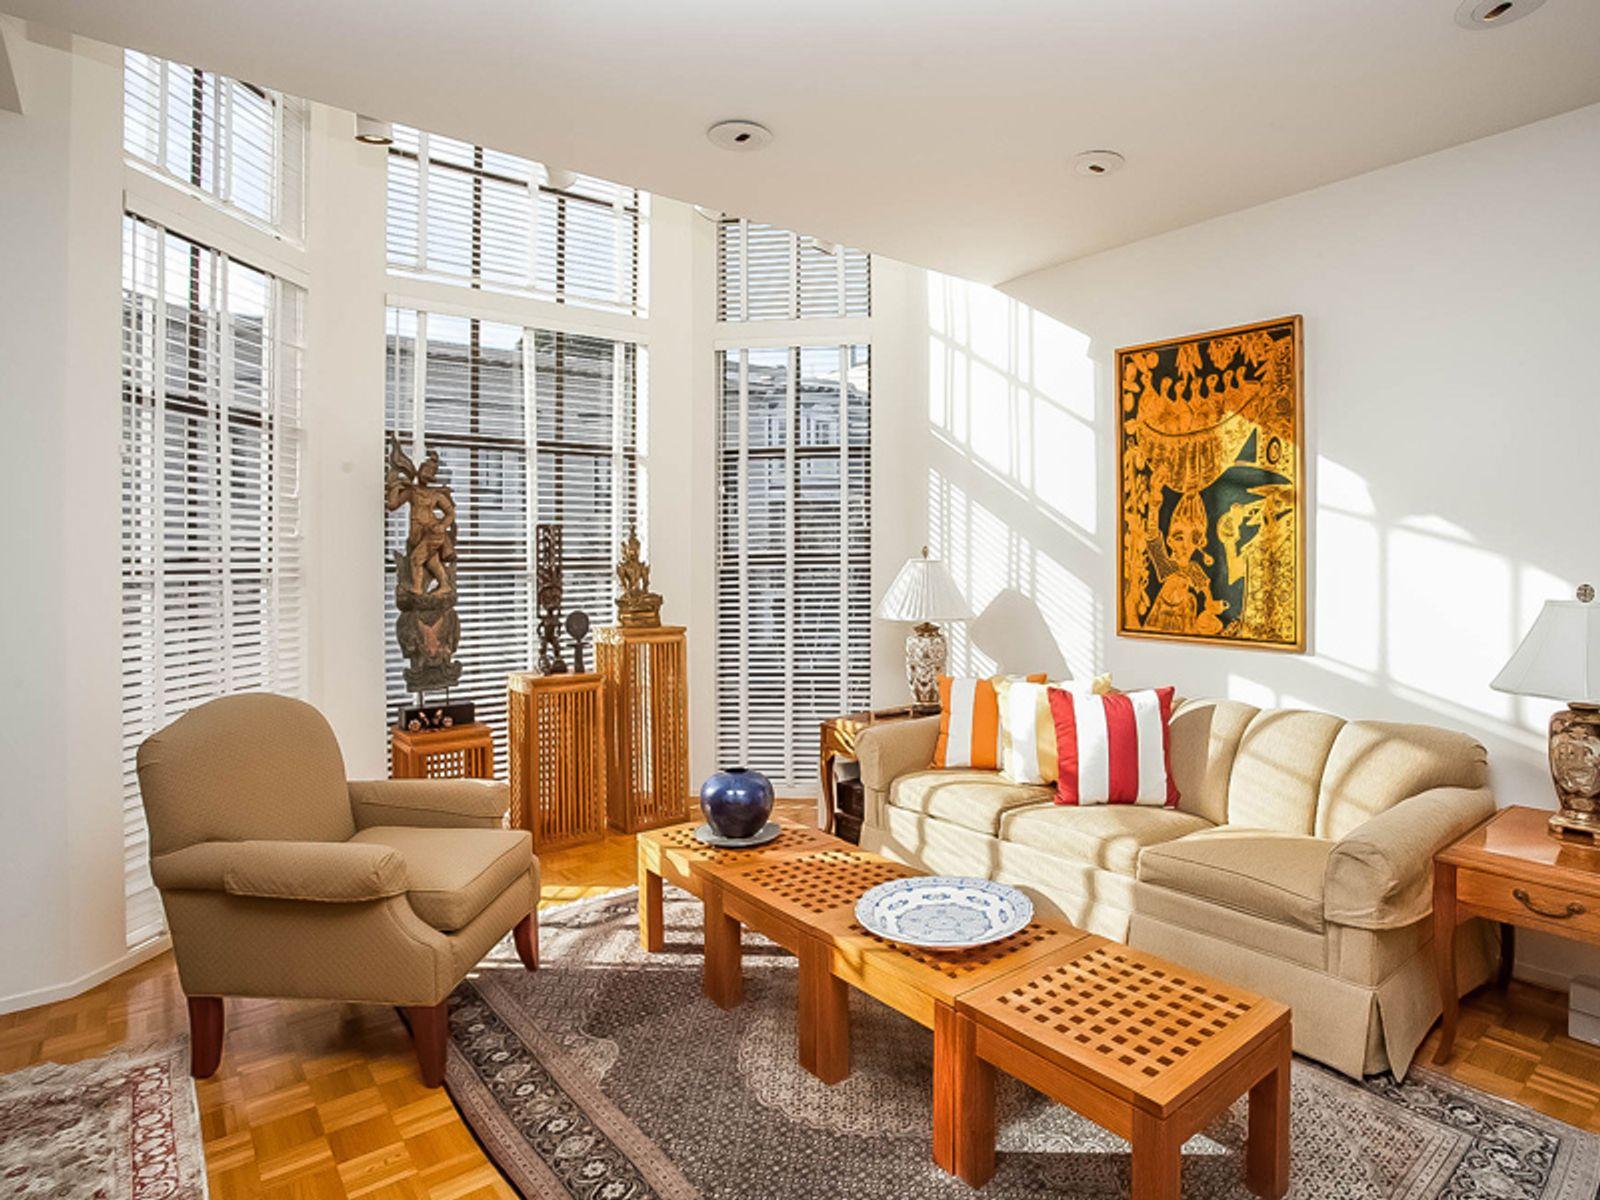 Pacific Heights Townhome Condominium